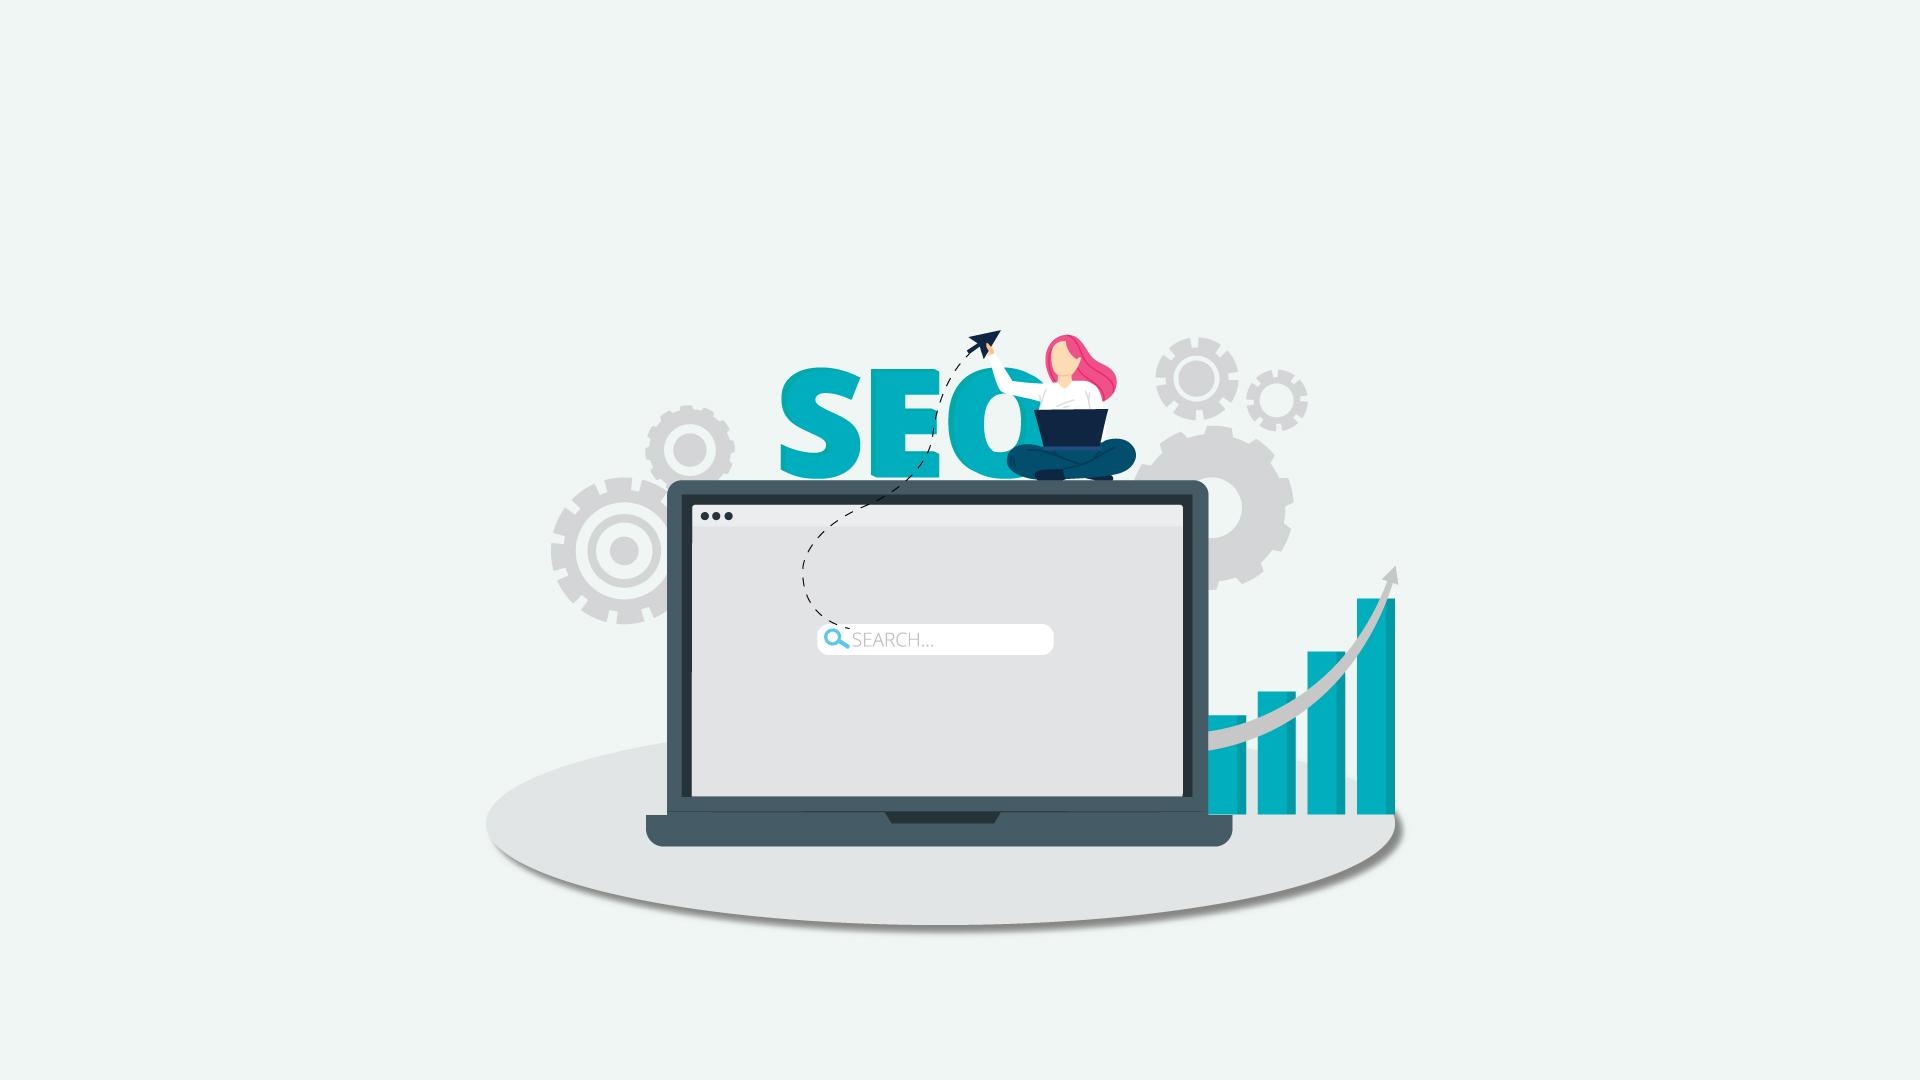 Seo 1 digital marketing ideas